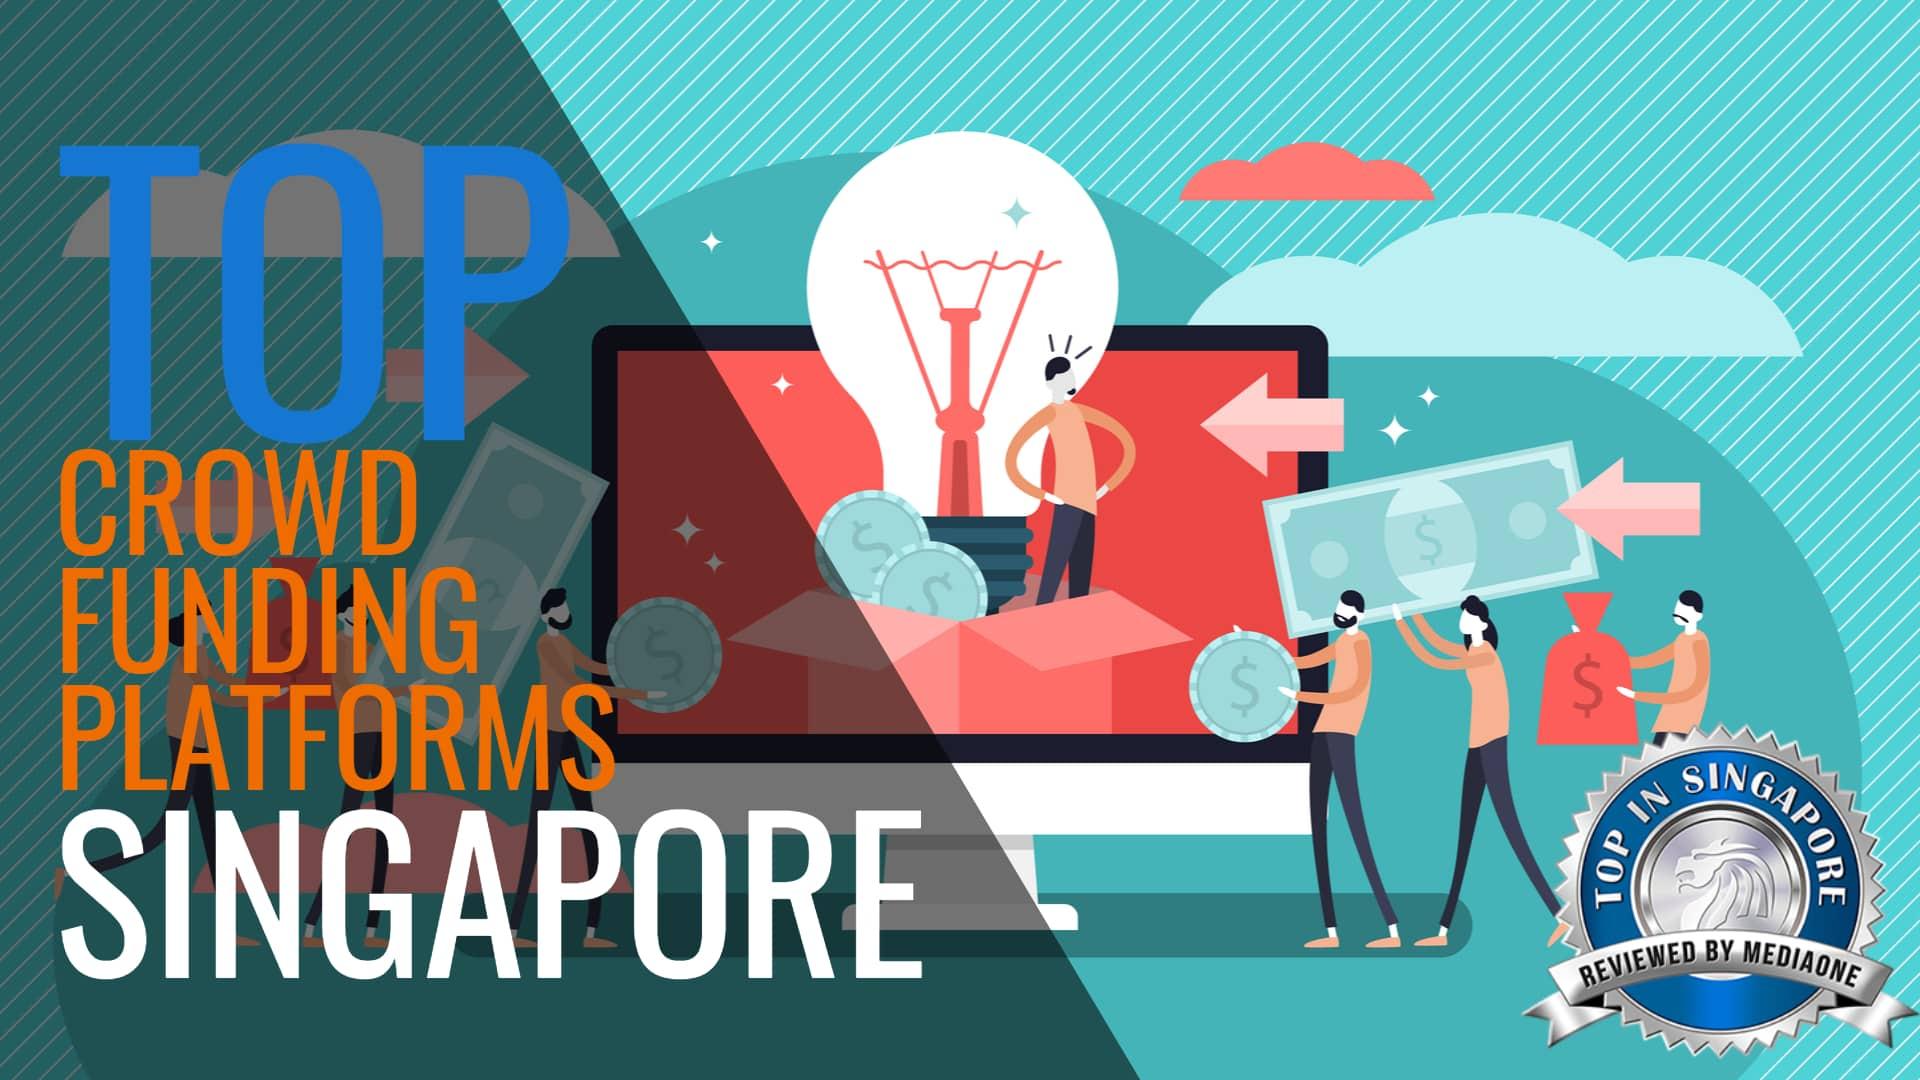 top-fundraising-platforms-in-singapore-2